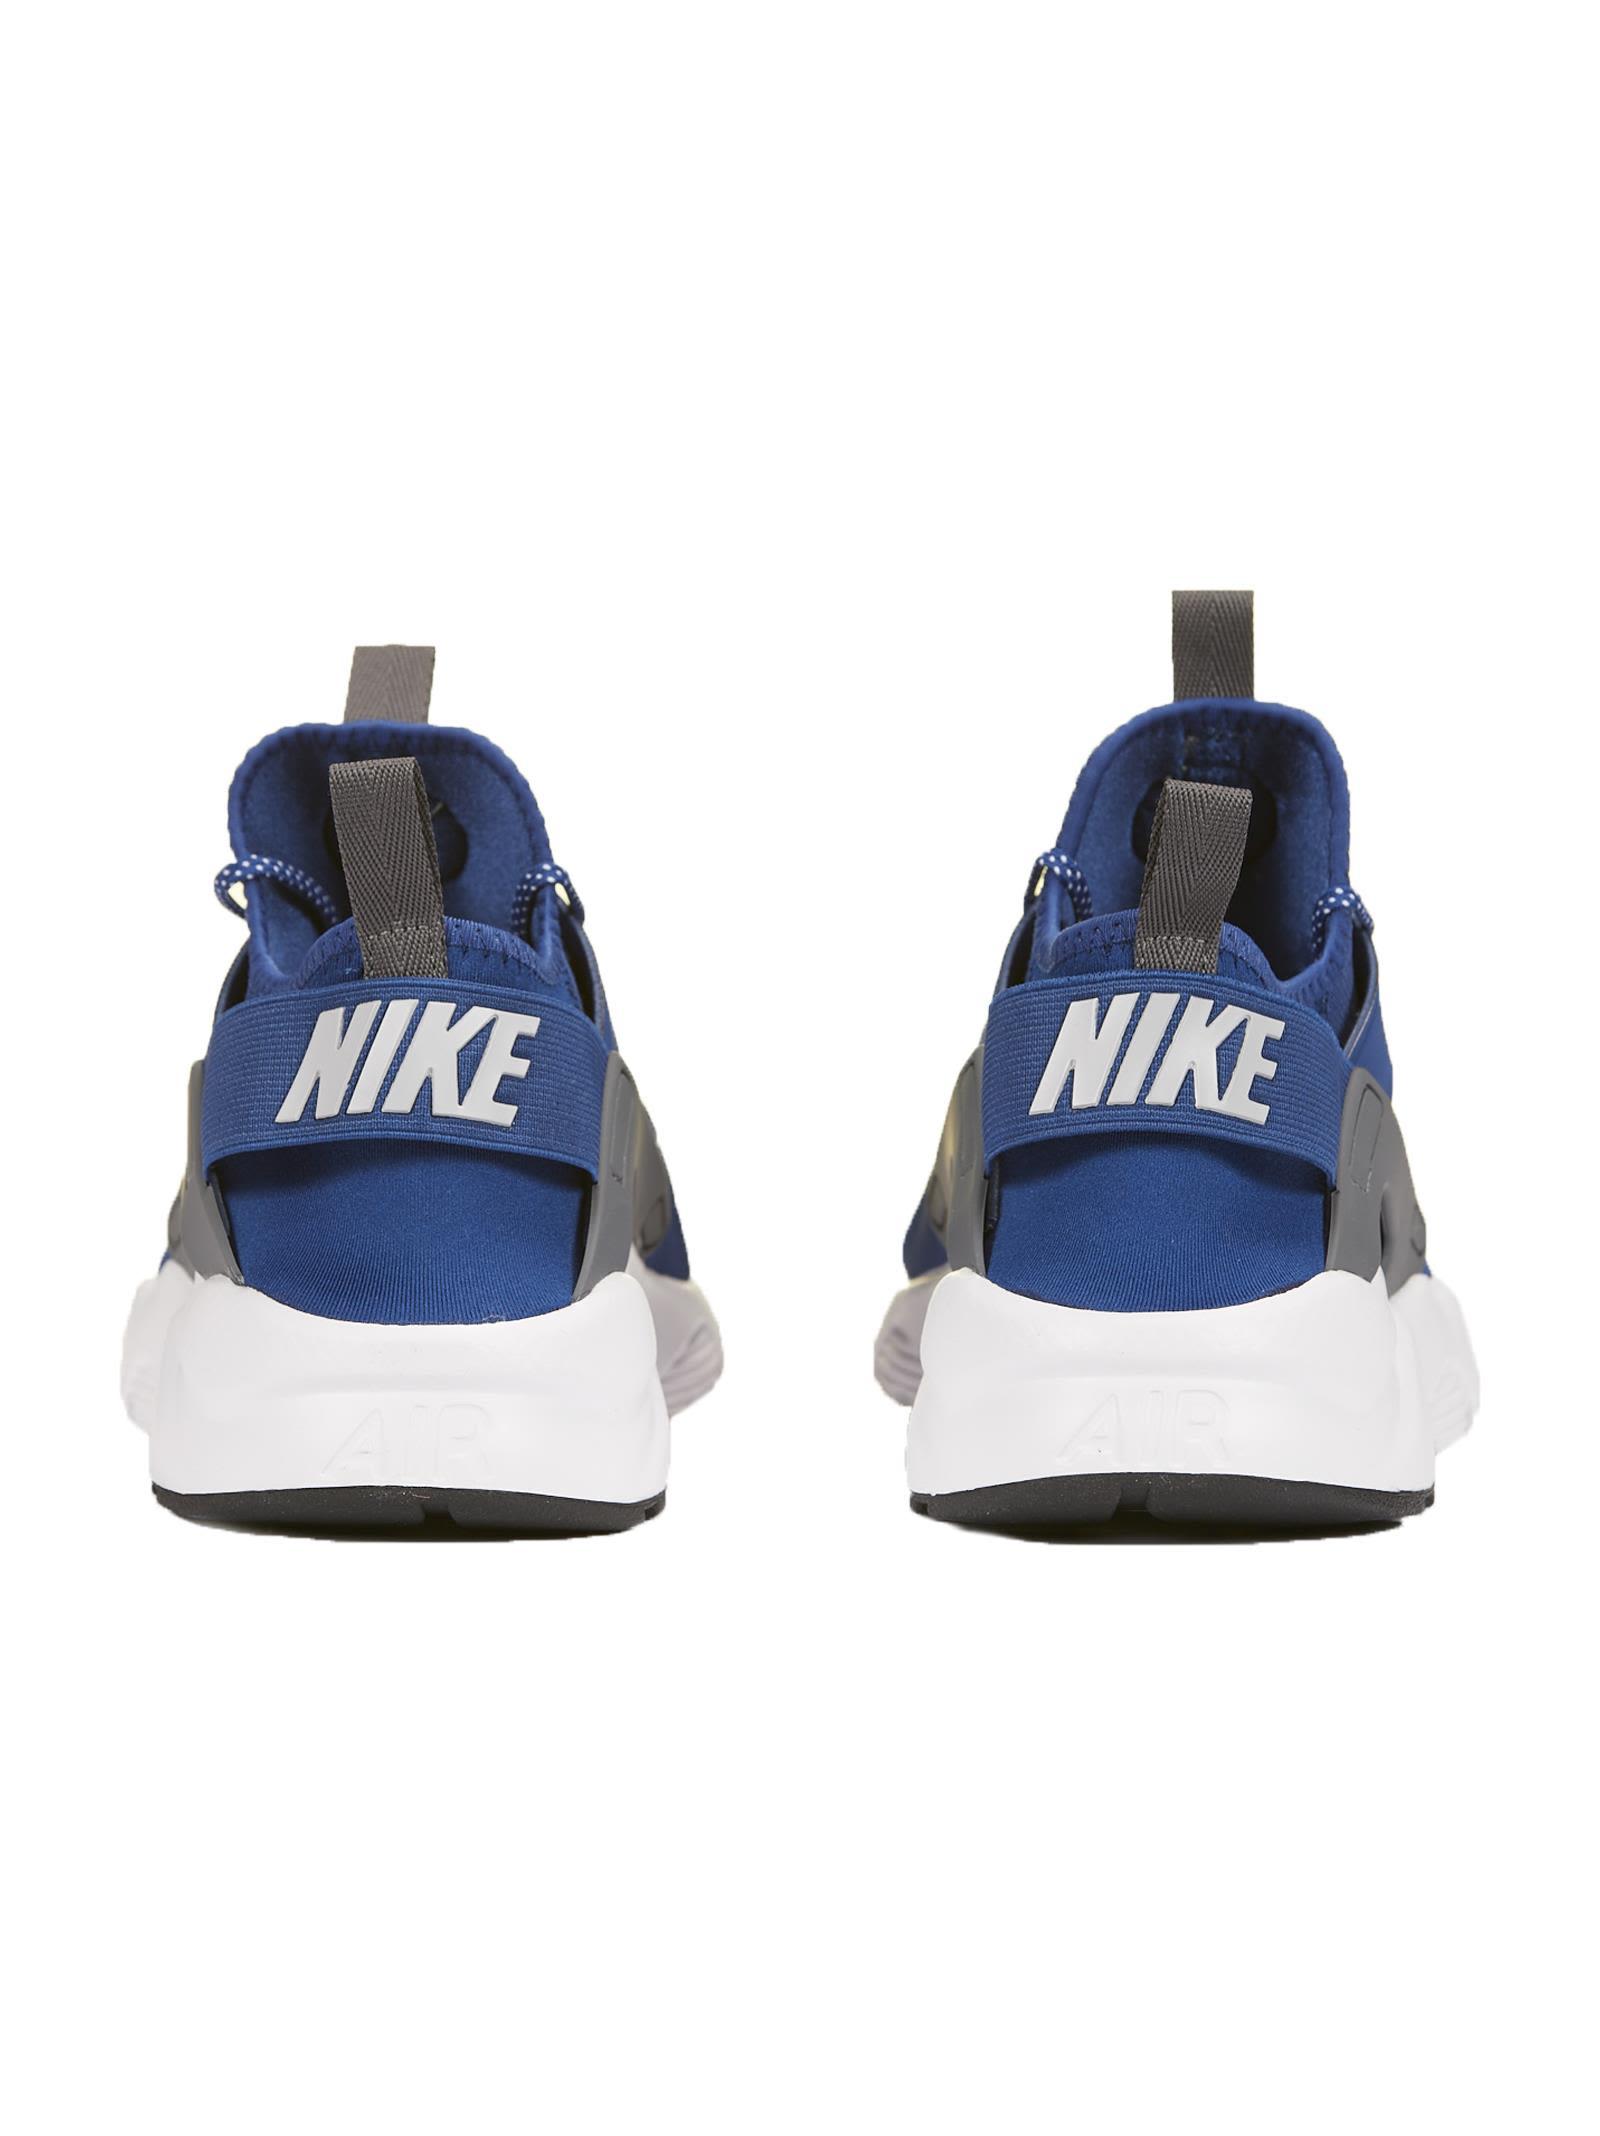 86c8ba430c81 Nike Air Huarache Run Ultra Sneakers - Blu bianco ...